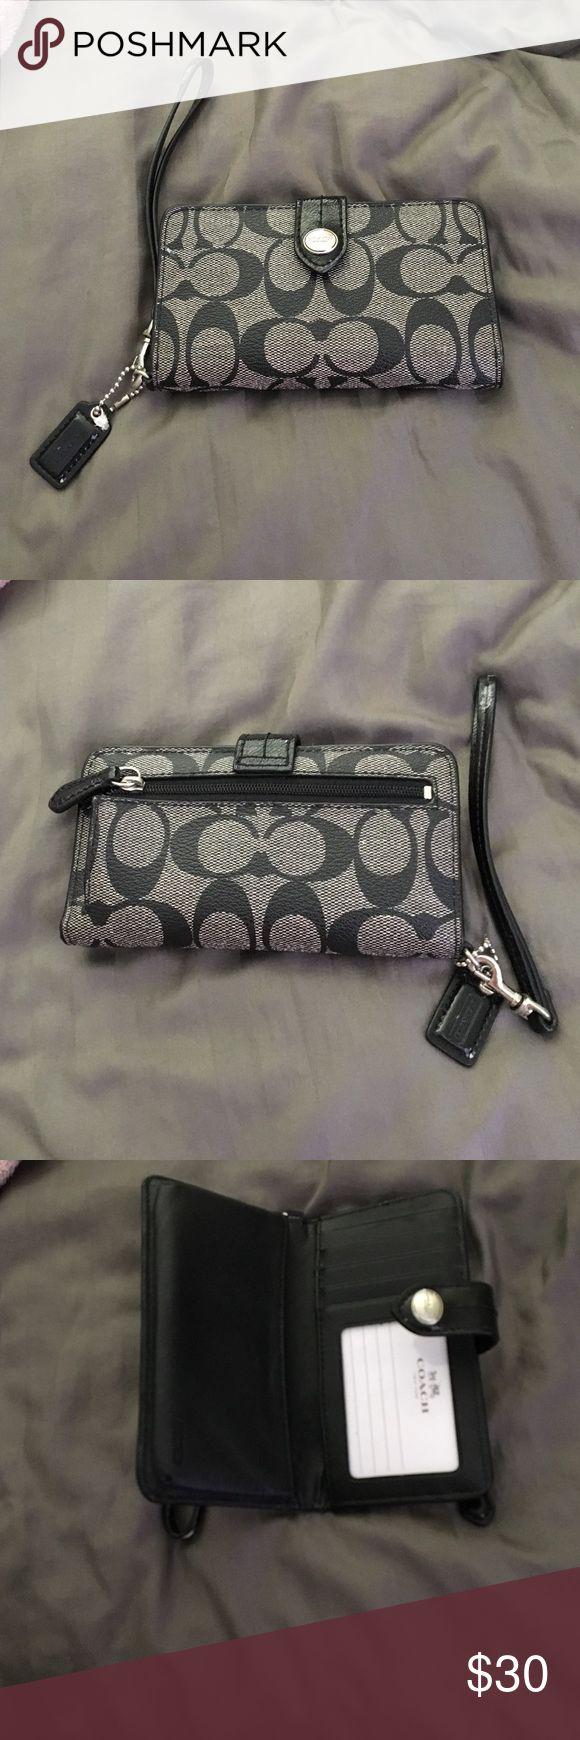 Black and grey coach wallet black and grey coach wallet. Great size and great condition Coach Bags Wallets